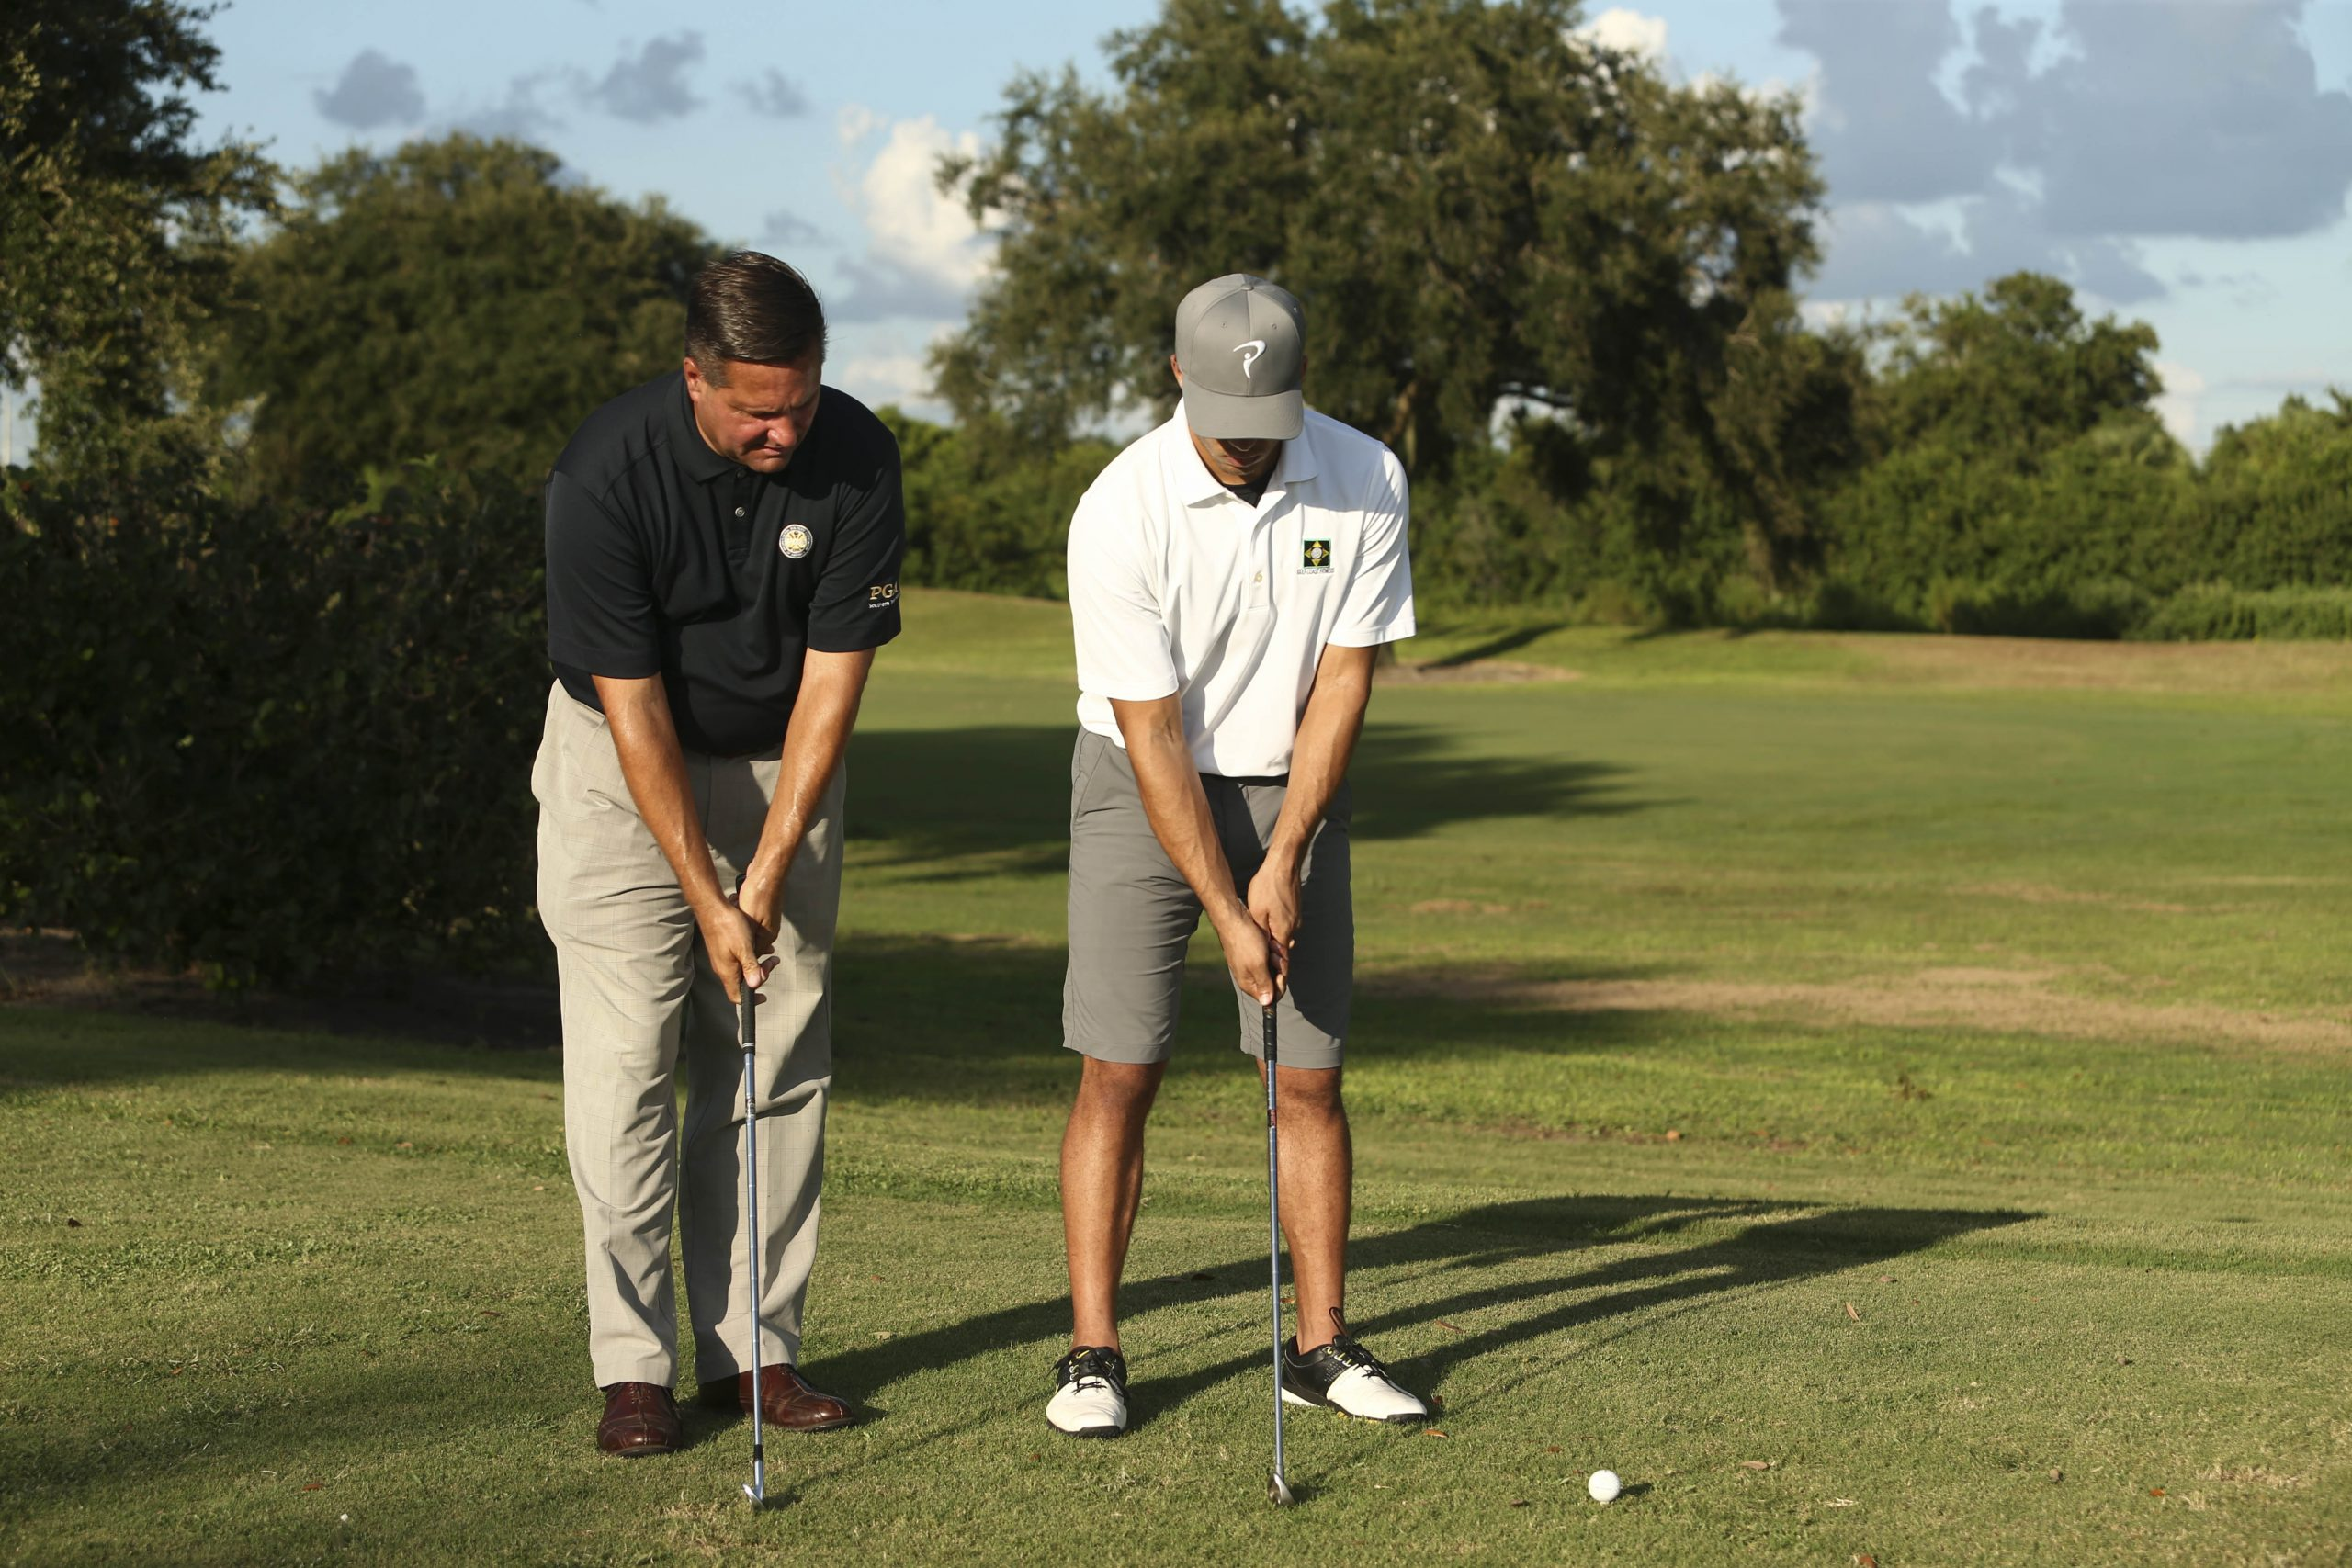 Adult Coaching Program For Golf